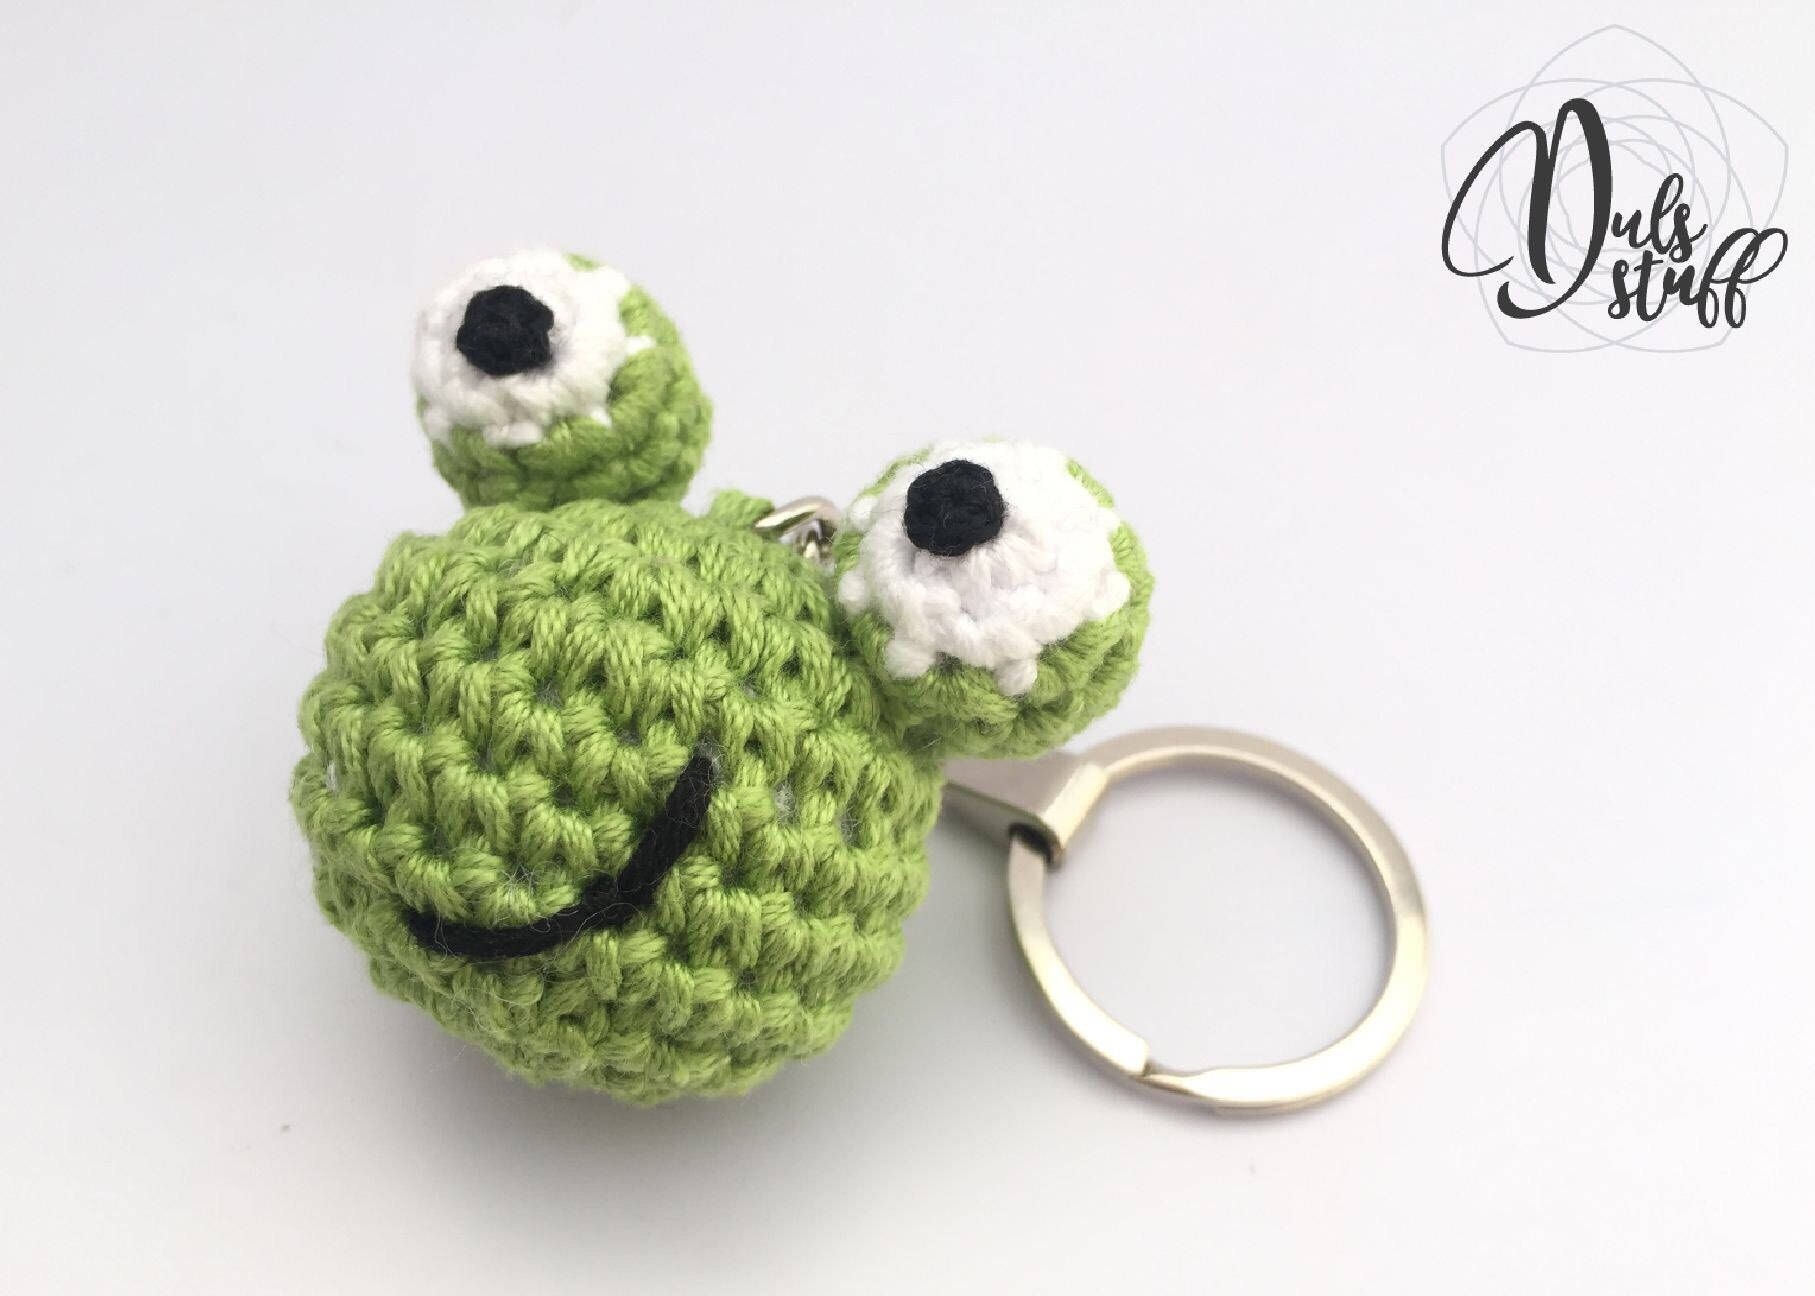 Frog crochet keychain, frog crochet, frog amigurumi, frog crochet ...